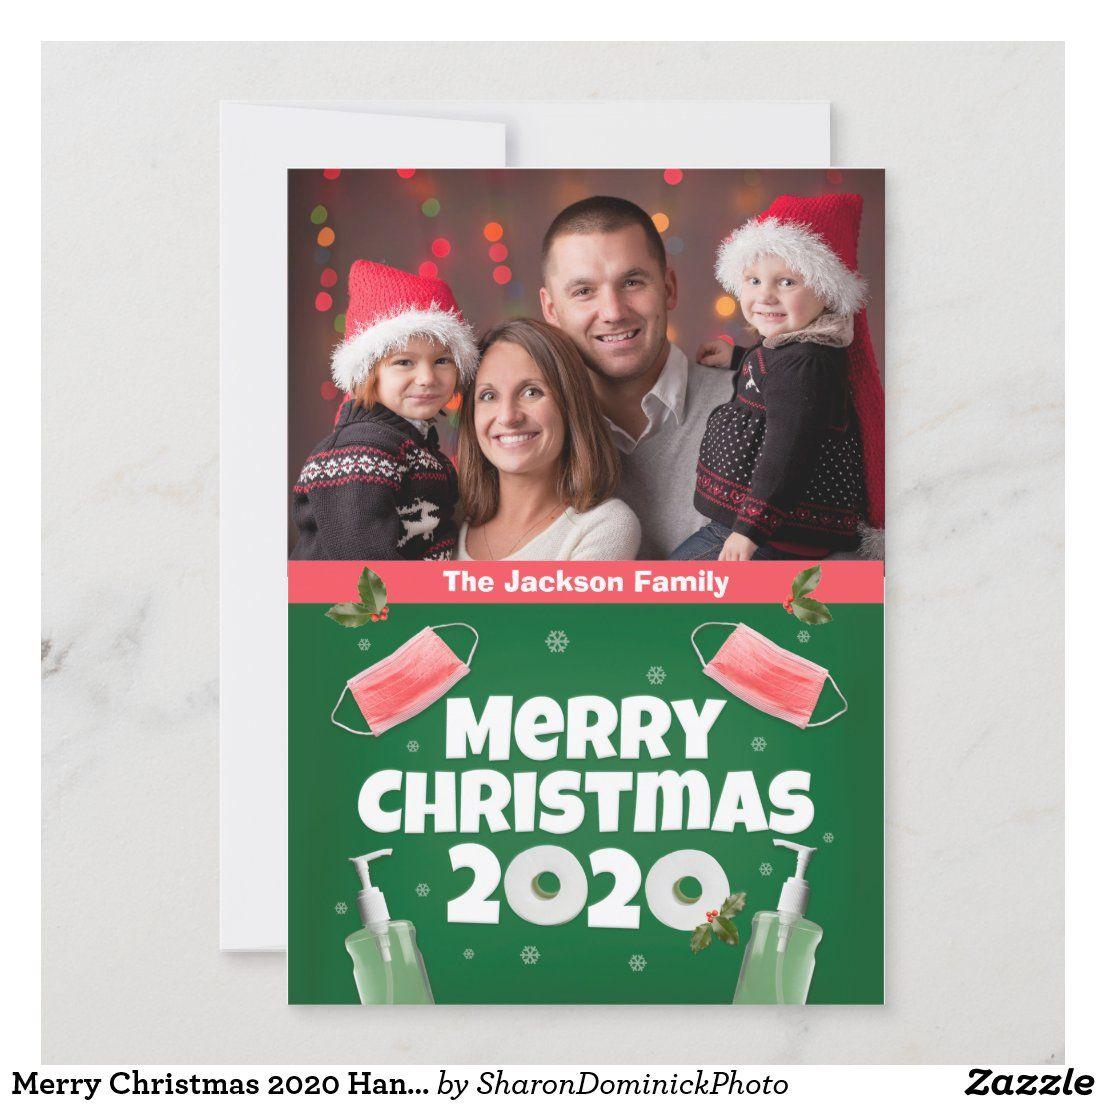 Merry Christmas 2020 Hand Sanitizer Face Mask Tp Card Zazzle Com Custom Holiday Card Merry Christmas Hand Sanitizer